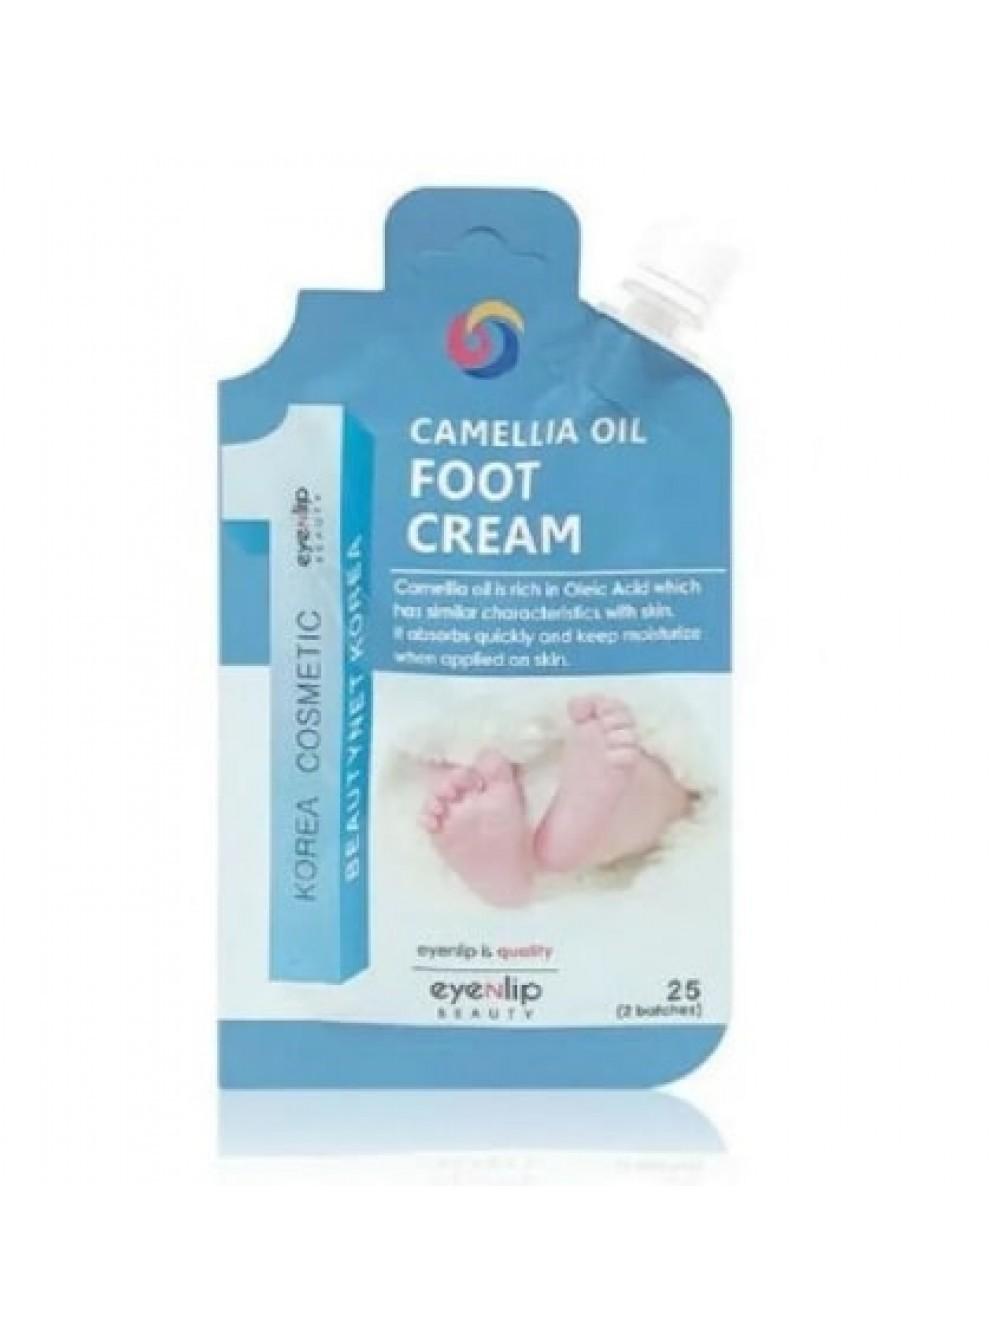 EYENLIP Крем для ног с маслом камелии EYENLIP CAMELLIA OIL FOOT CREAM 25 гр foot1-1000x1340.jpg